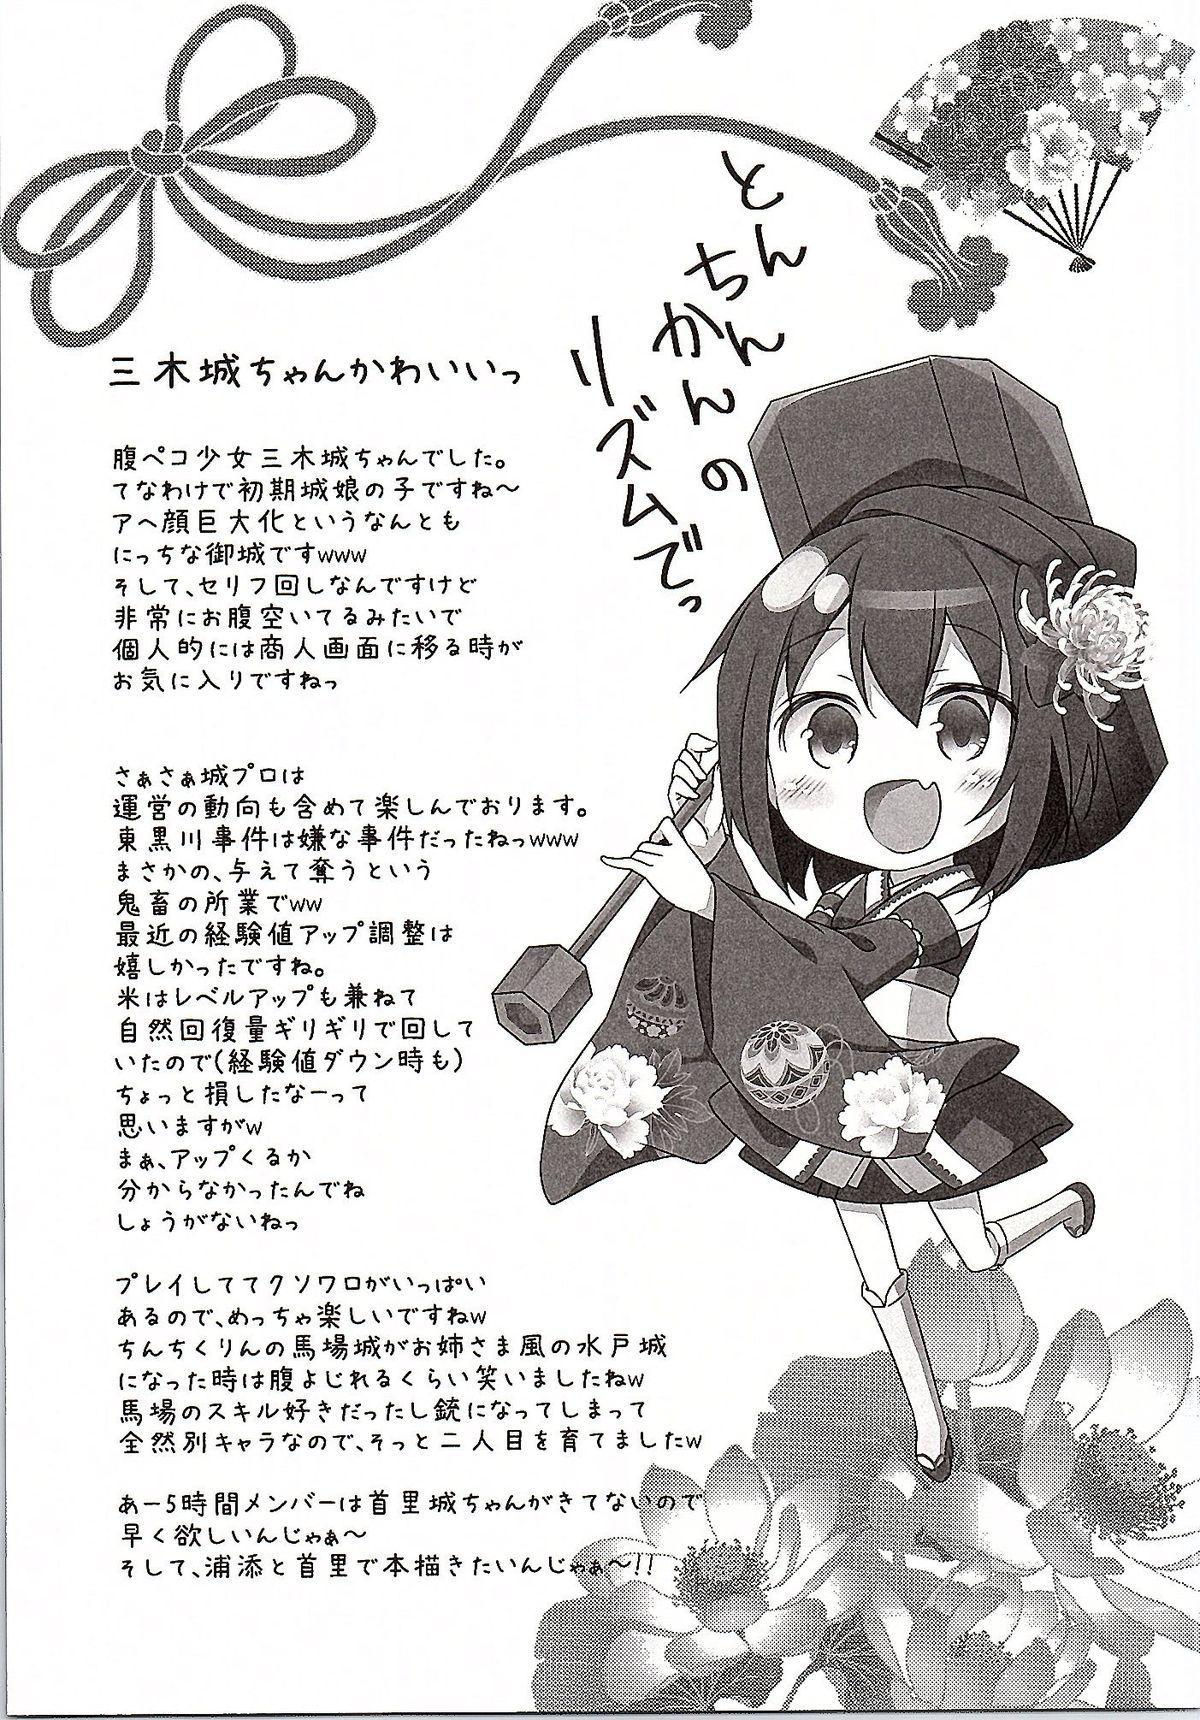 (C87) [Kaname (Siina Yuuki)] Totsugiko!!! Mikishiro-chan Ikazuchi-chan (Oshiro Project ~CASTLE DEFENSE~, Kantai Collection -KanColle-) 9